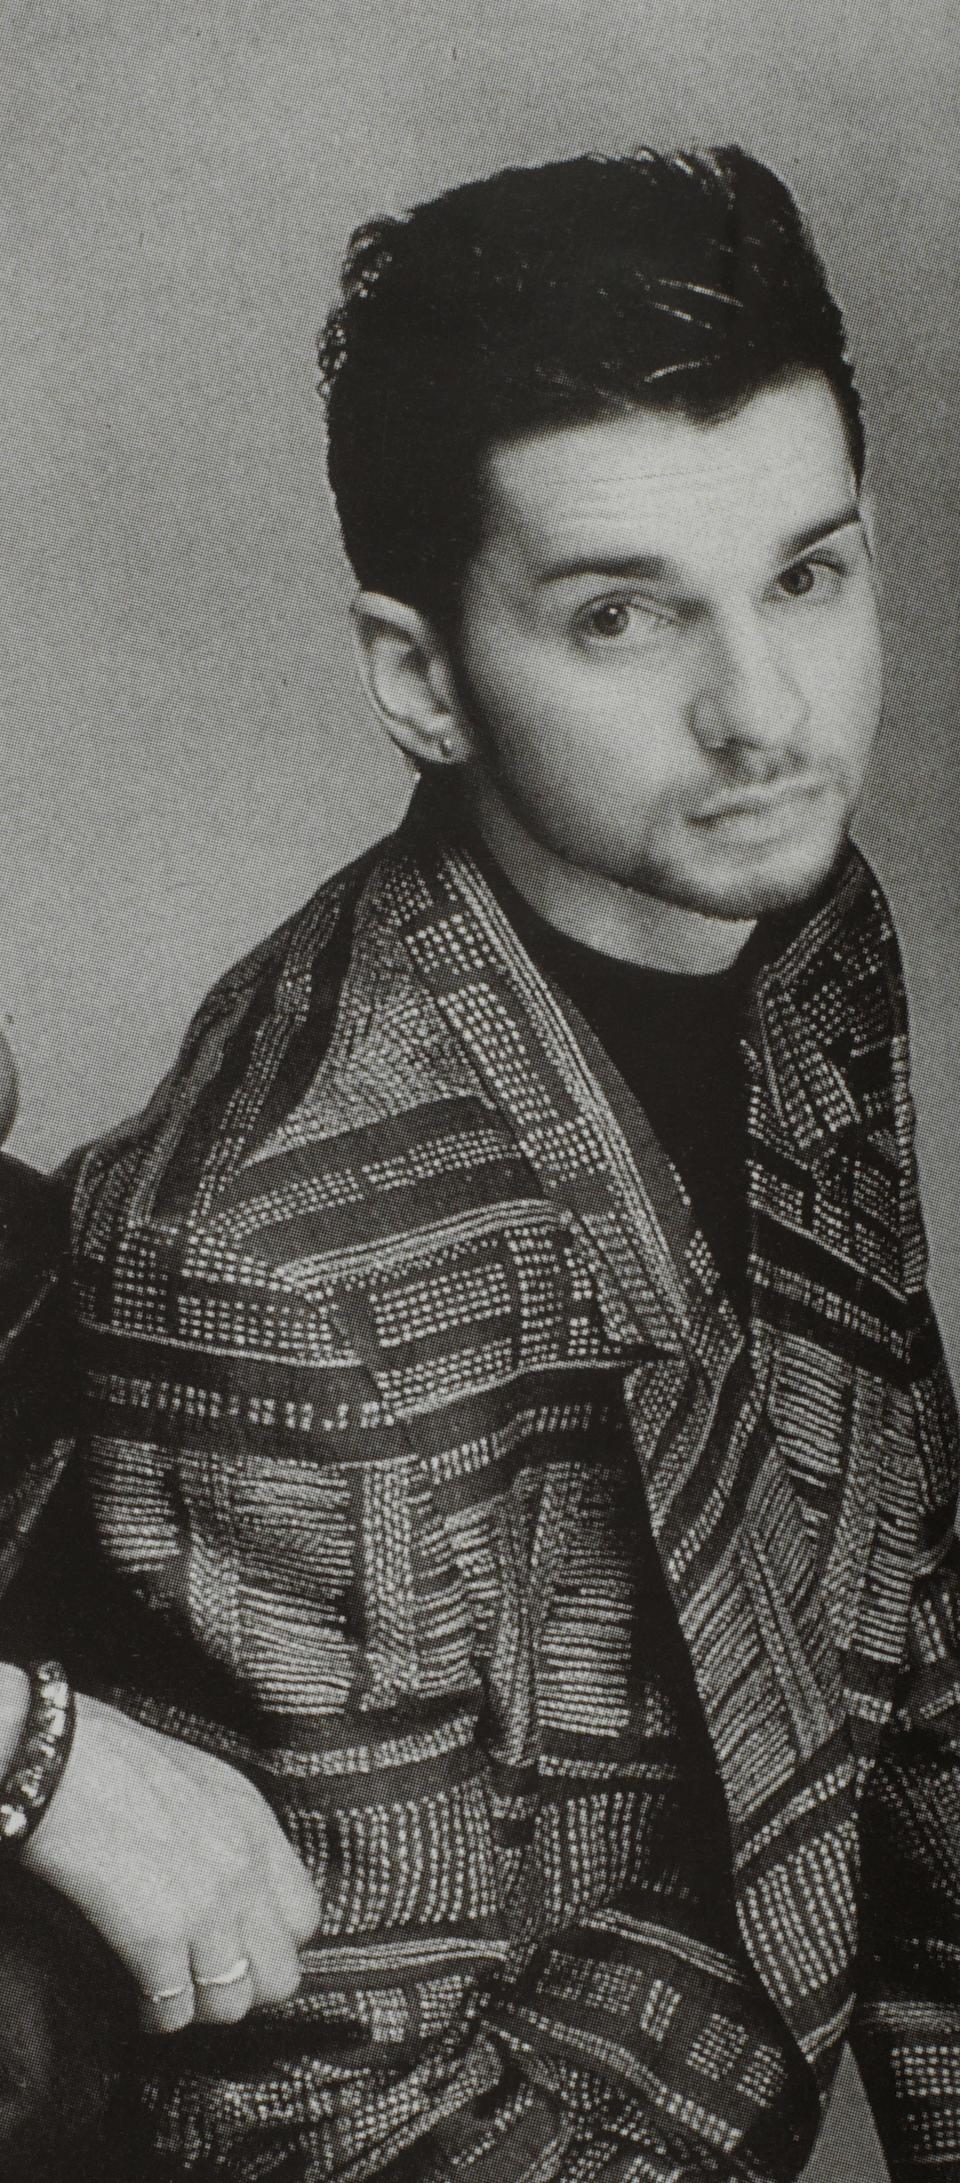 Depeche Mode: Vinyl acetate, test pressing and LP,